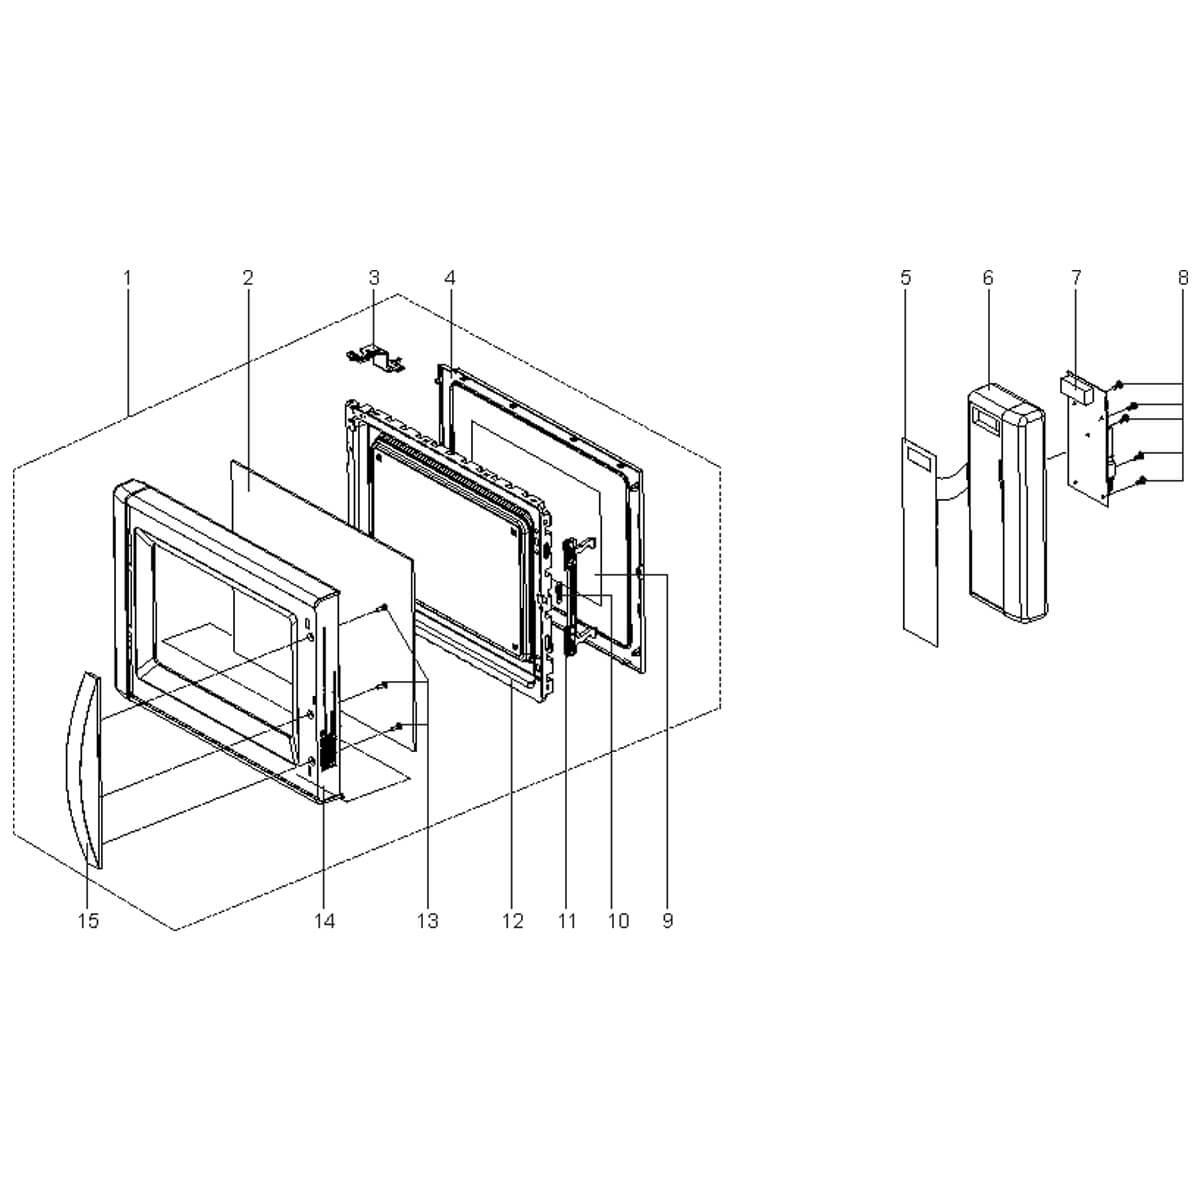 Placa Principal Display 127V  Para Micro-ondas Electrolux MEV41 - 70001681 A20769601